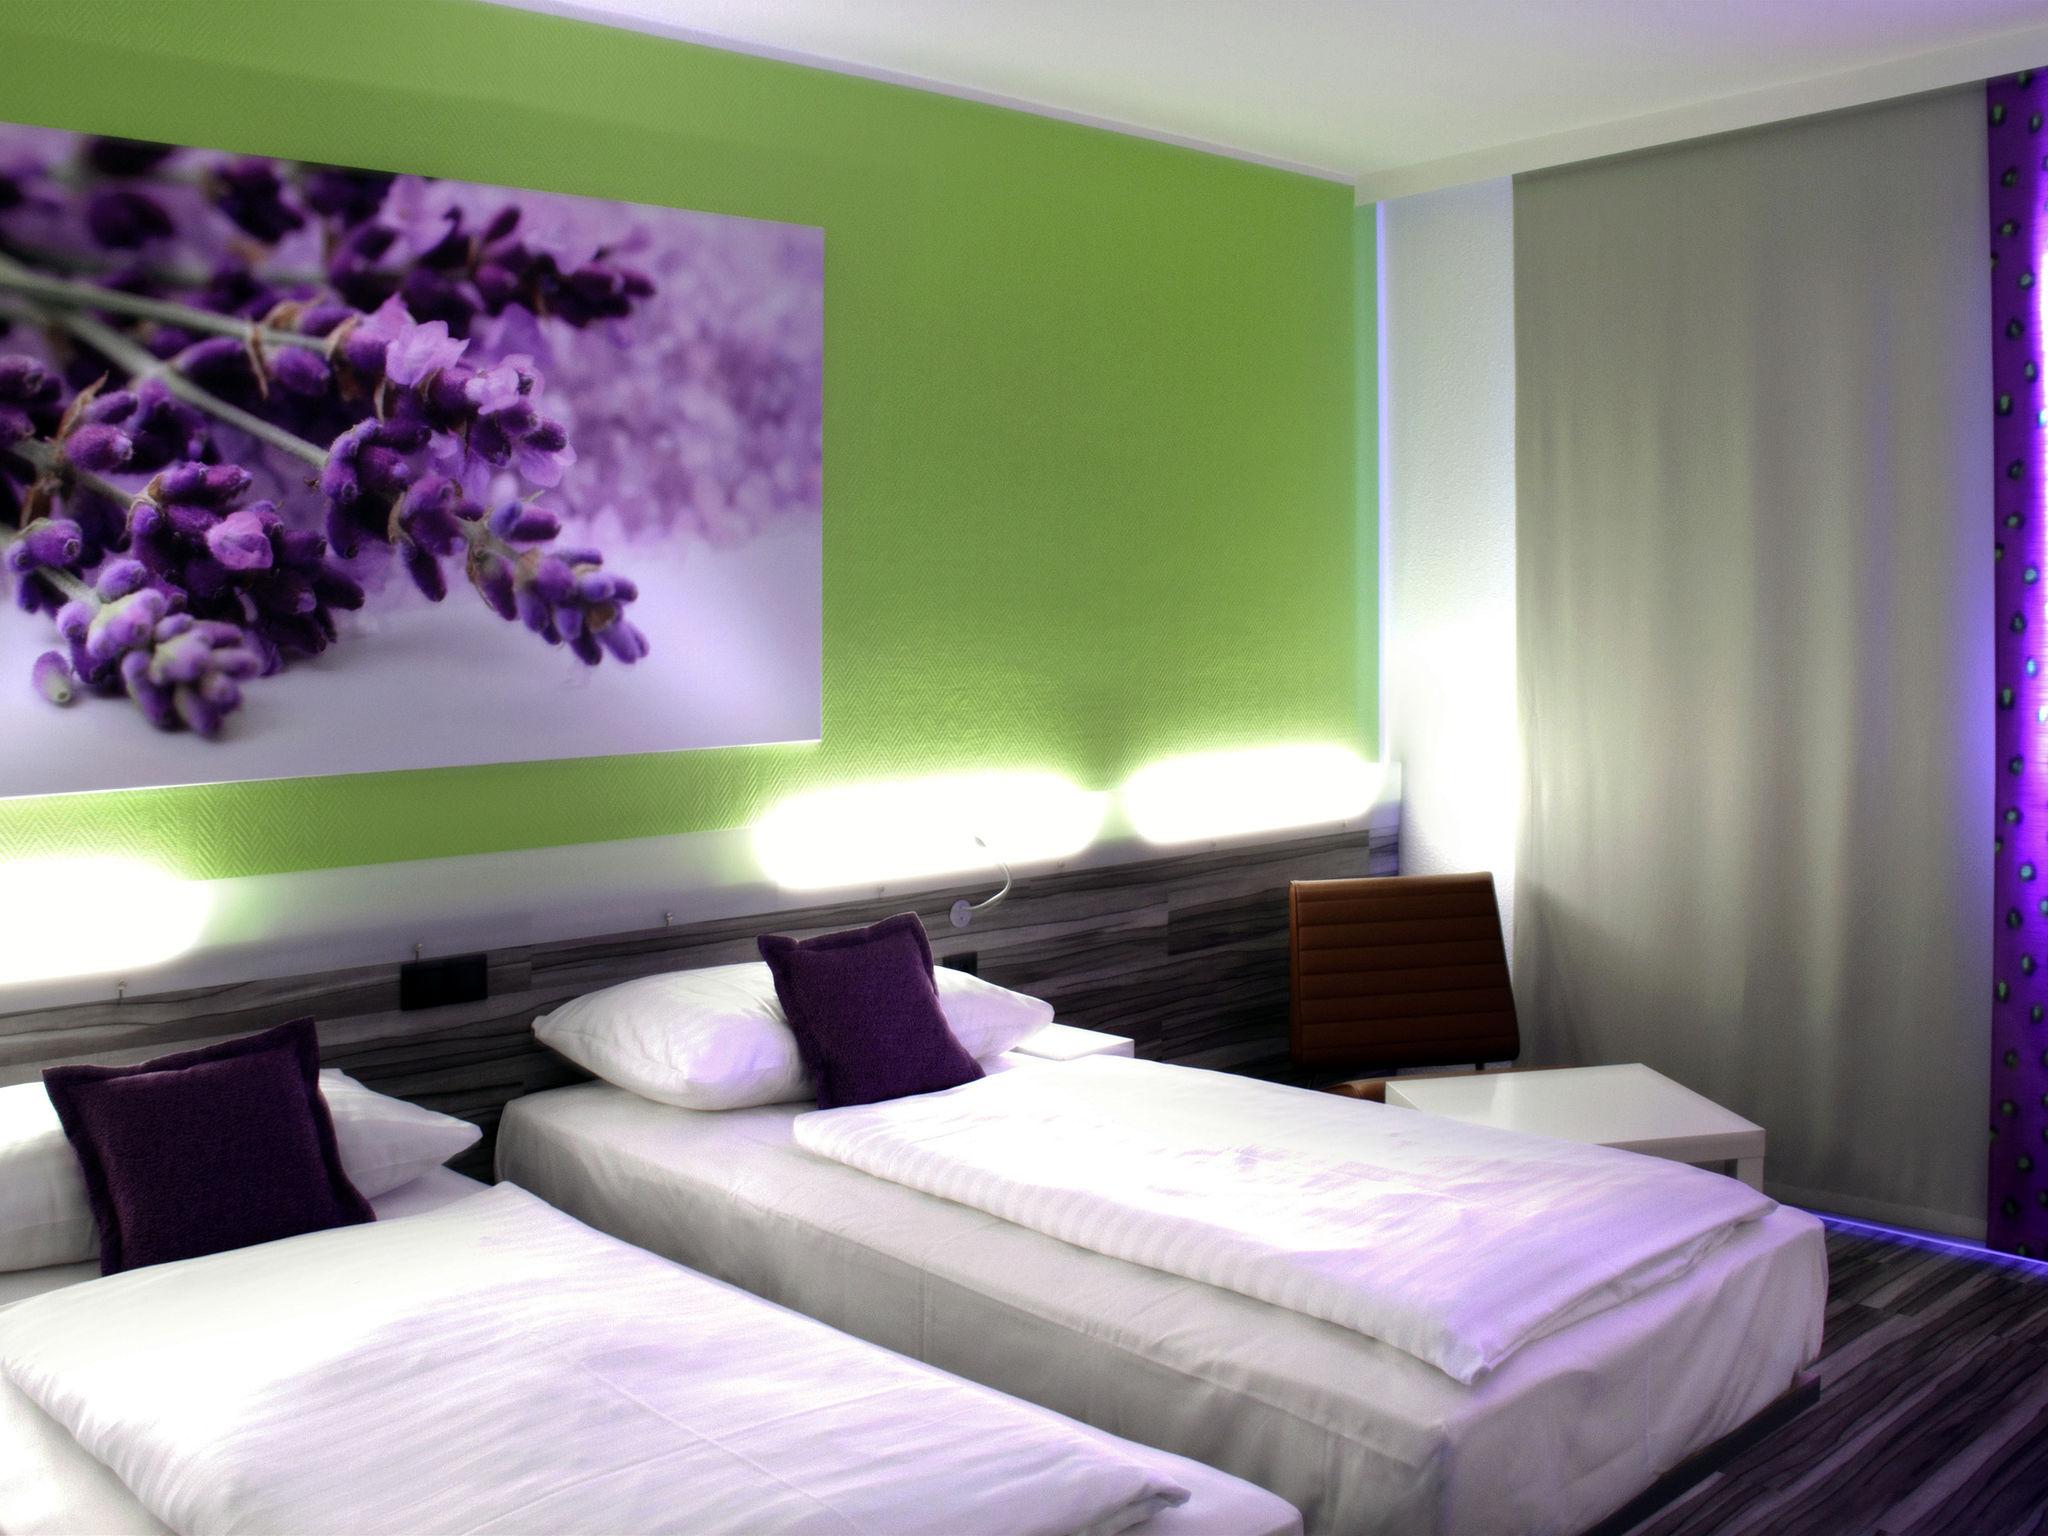 ibis Styles Linz Design Hotel Linz ACCOR